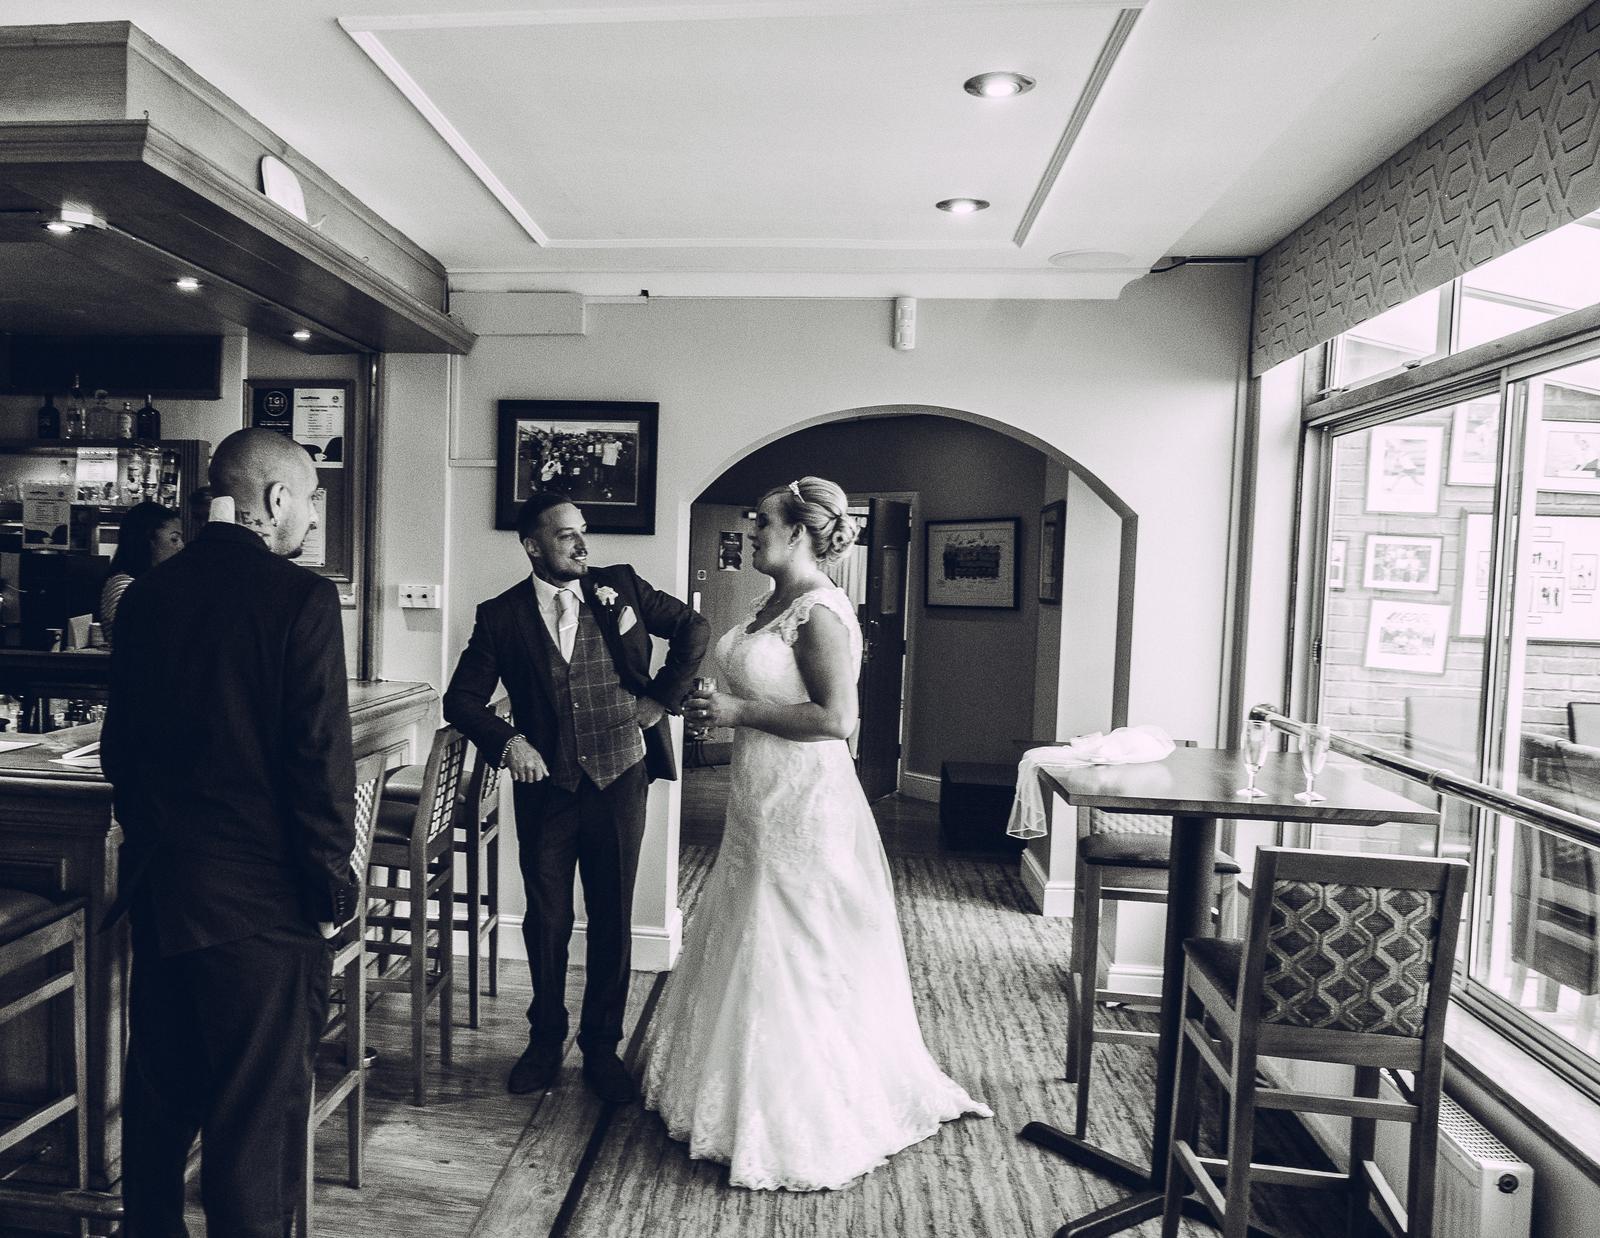 Mr&Mrs Ogborne, Wolverhampton - Obrázok č. 13